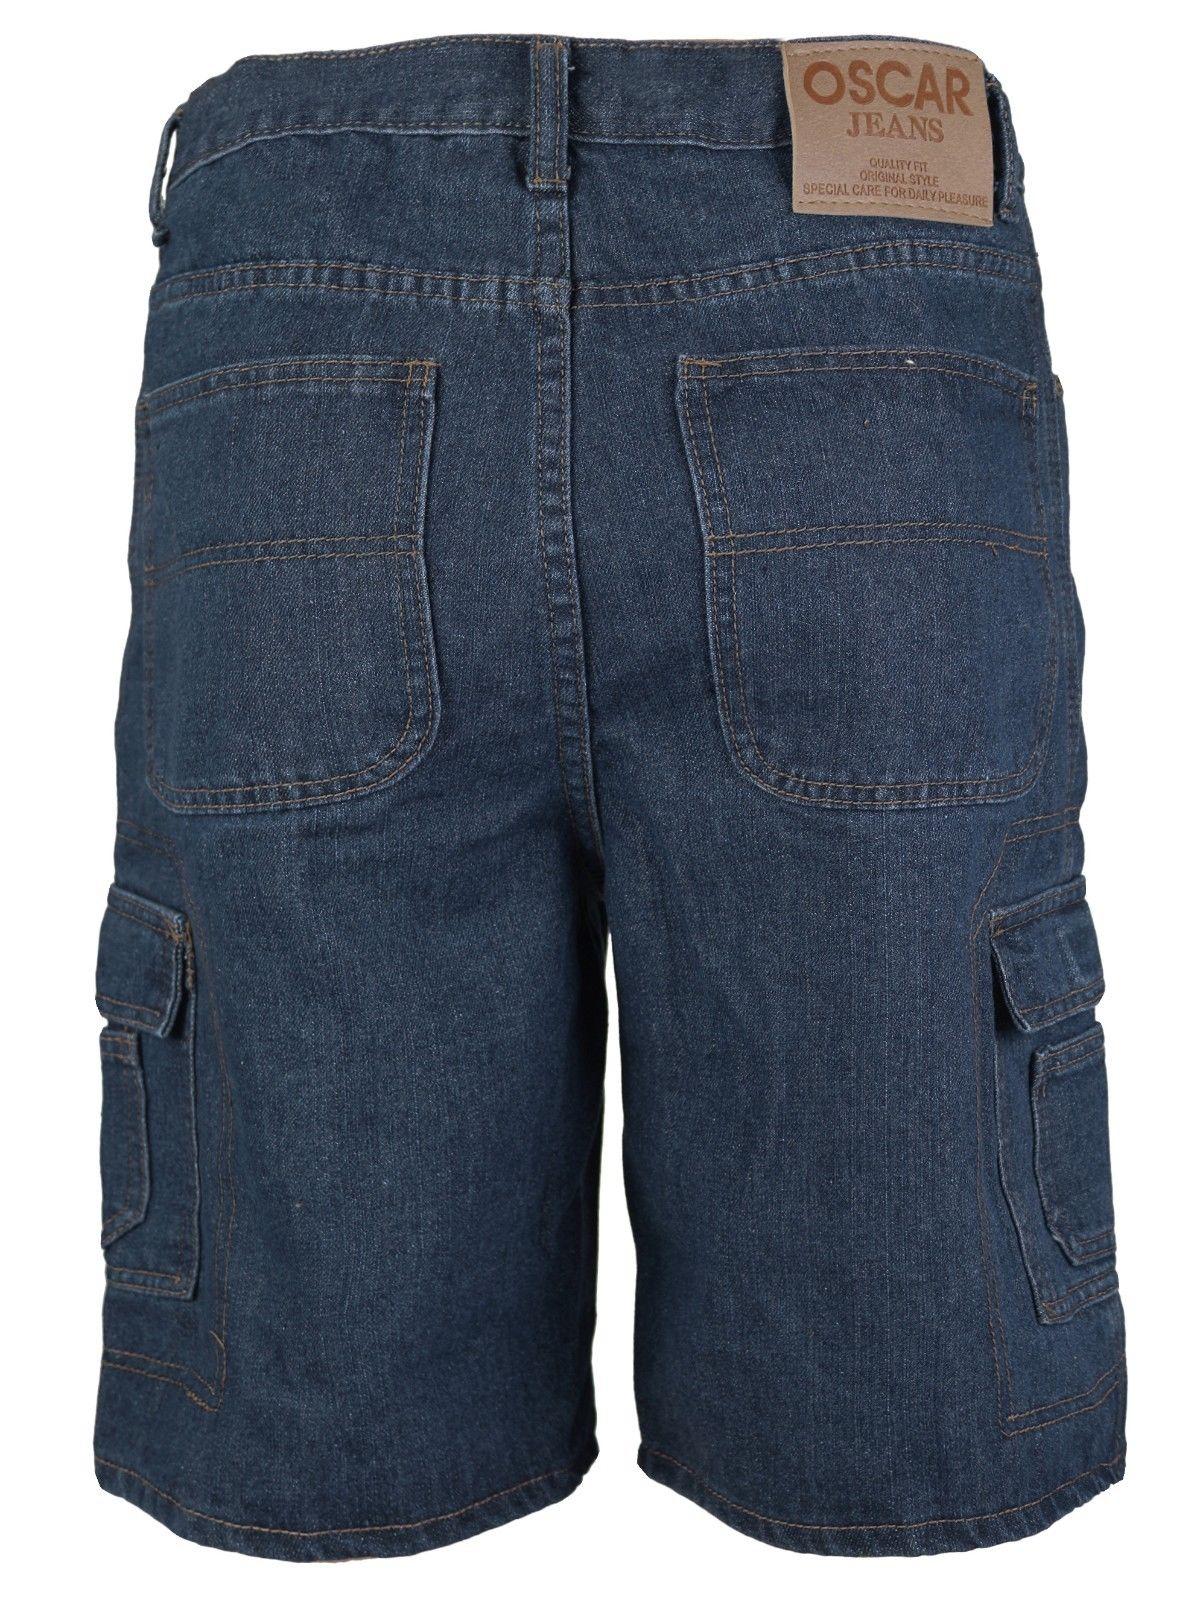 Men-039-s-Premium-Cotton-Multi-Pocket-Relaxed-Fit-Stonewash-Denim-Jean-Cargo-Shorts thumbnail 14